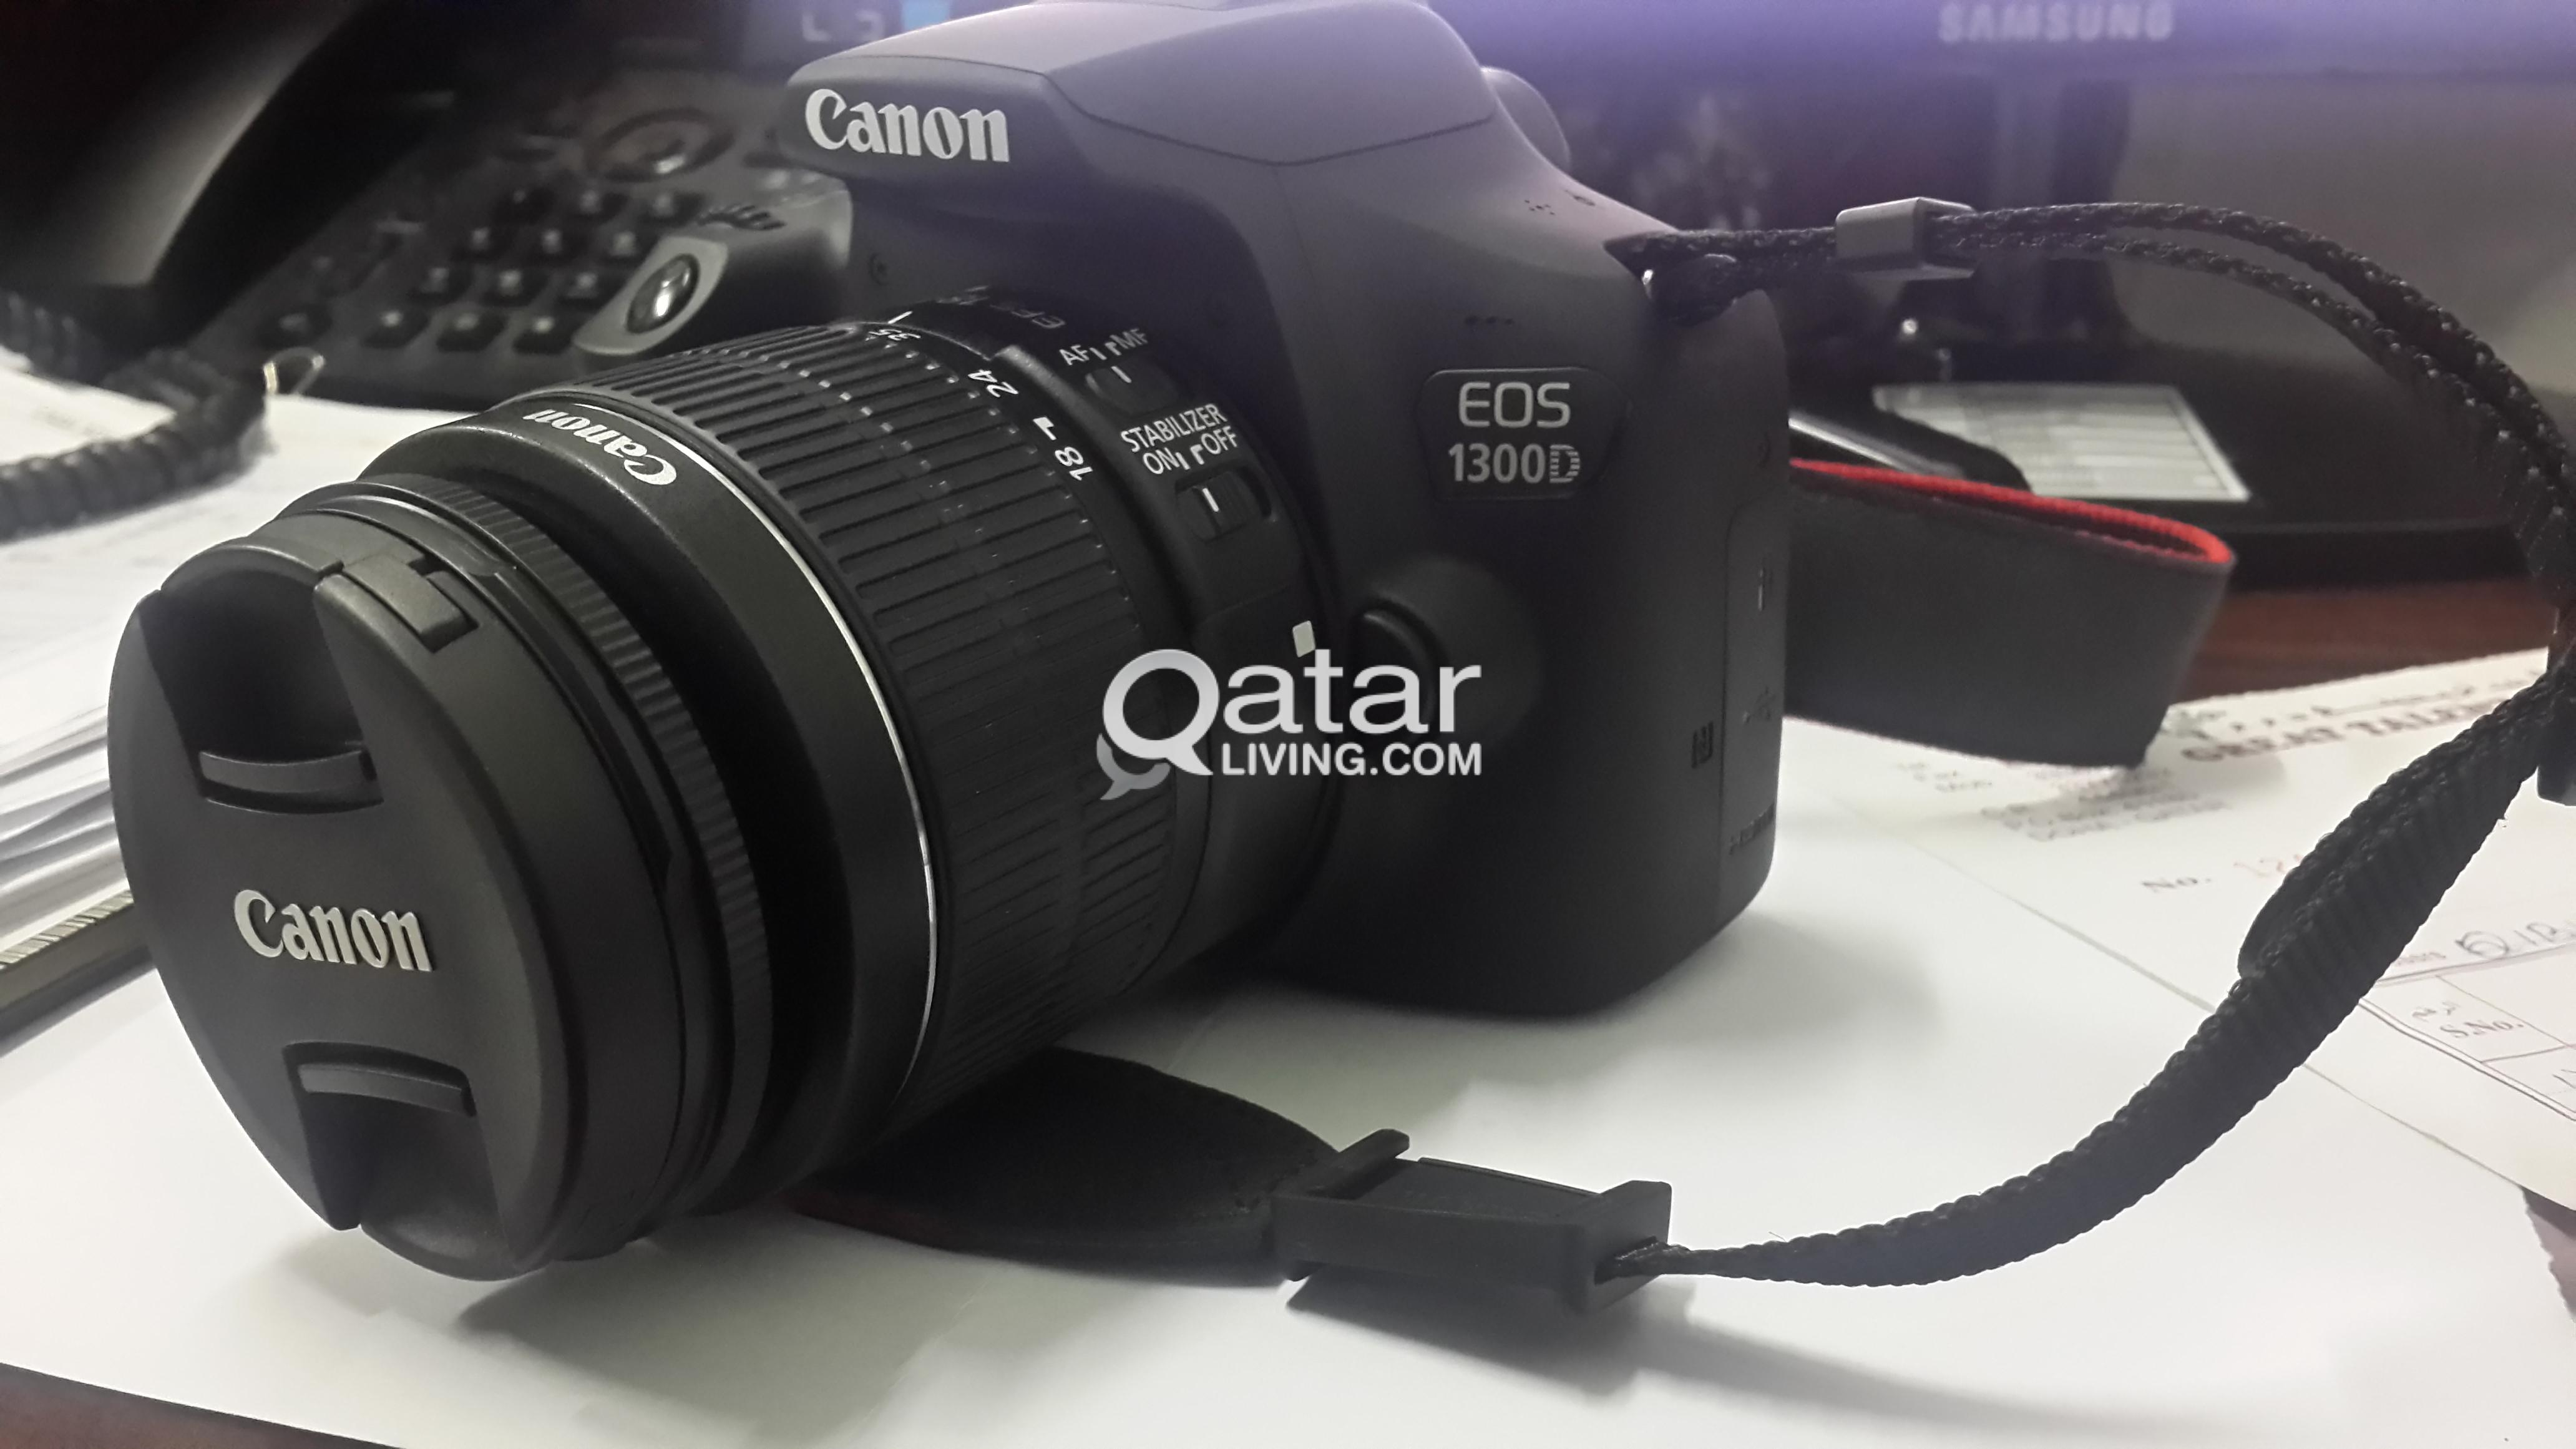 CANON 1300D DSLR with WiFi +18-55mm lens+bag | Qatar Living